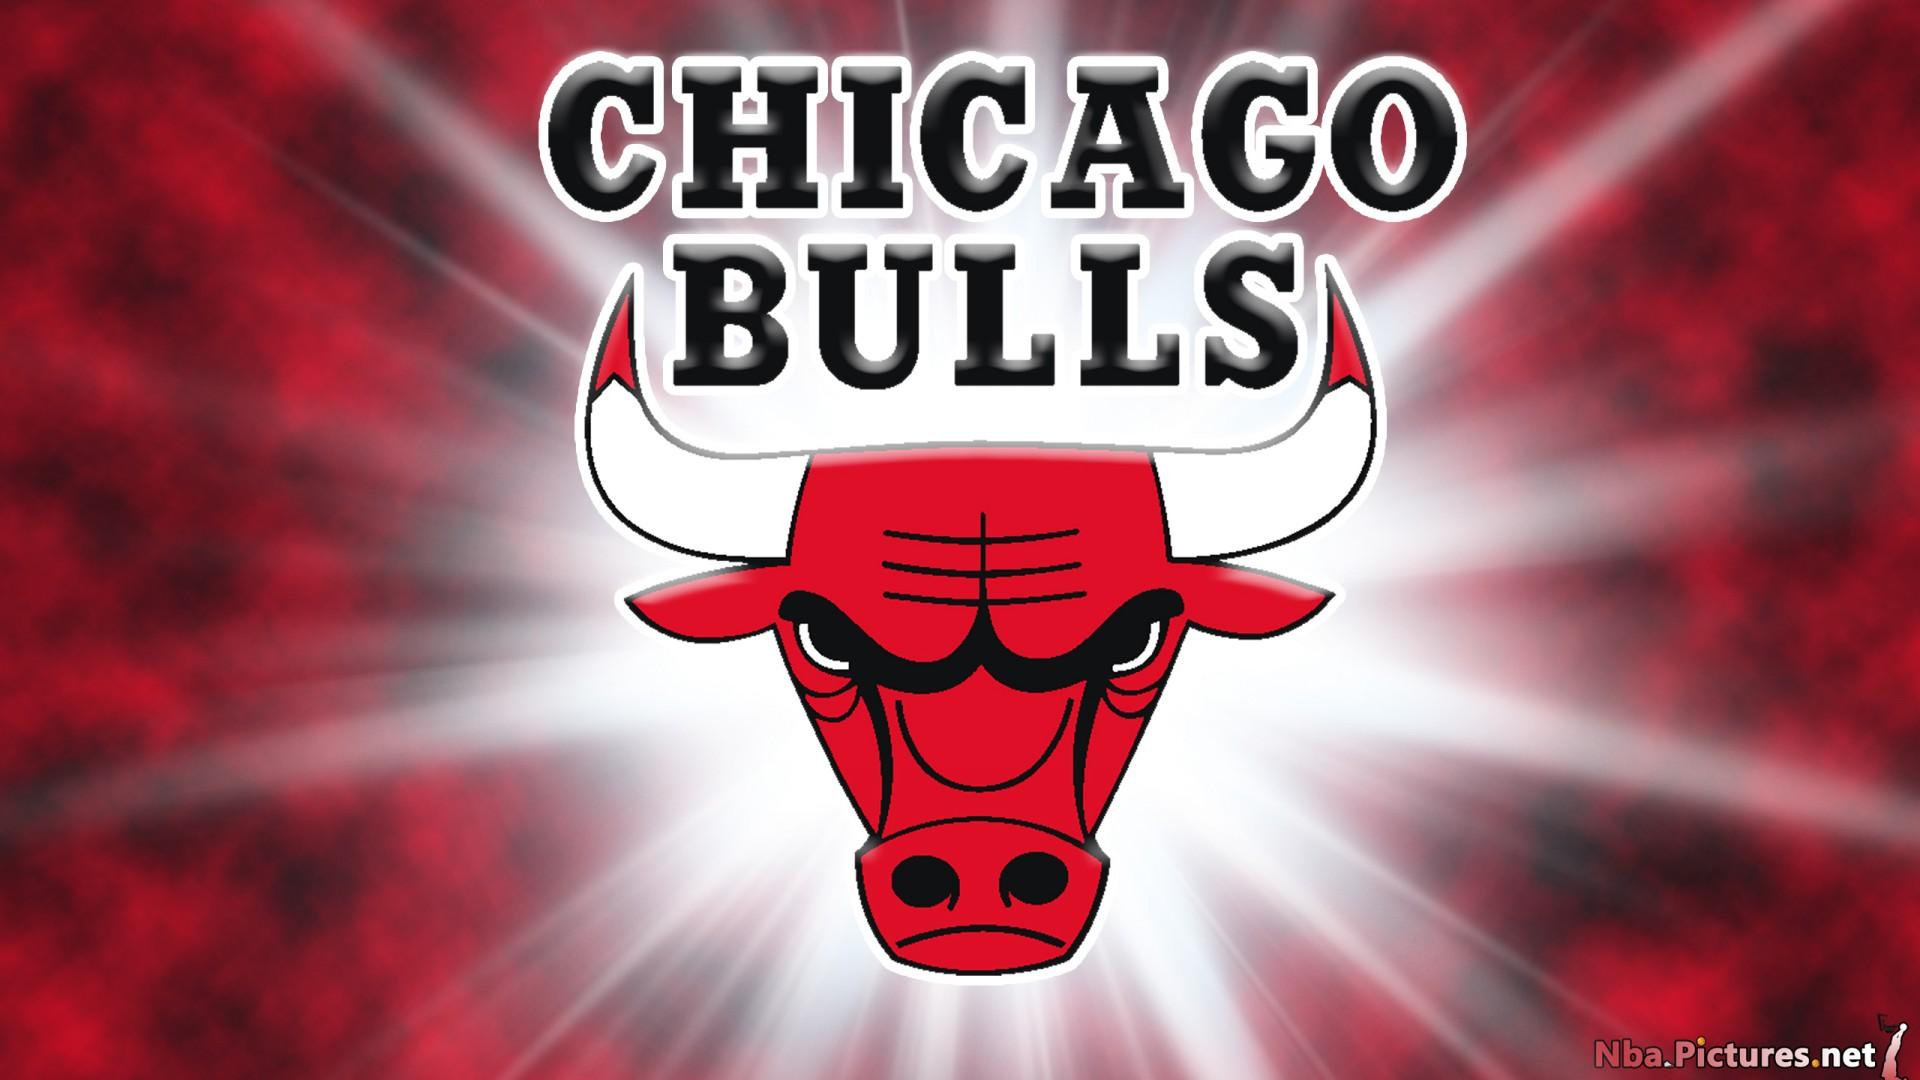 Chicago Bulls Wallpaper Hd 2016